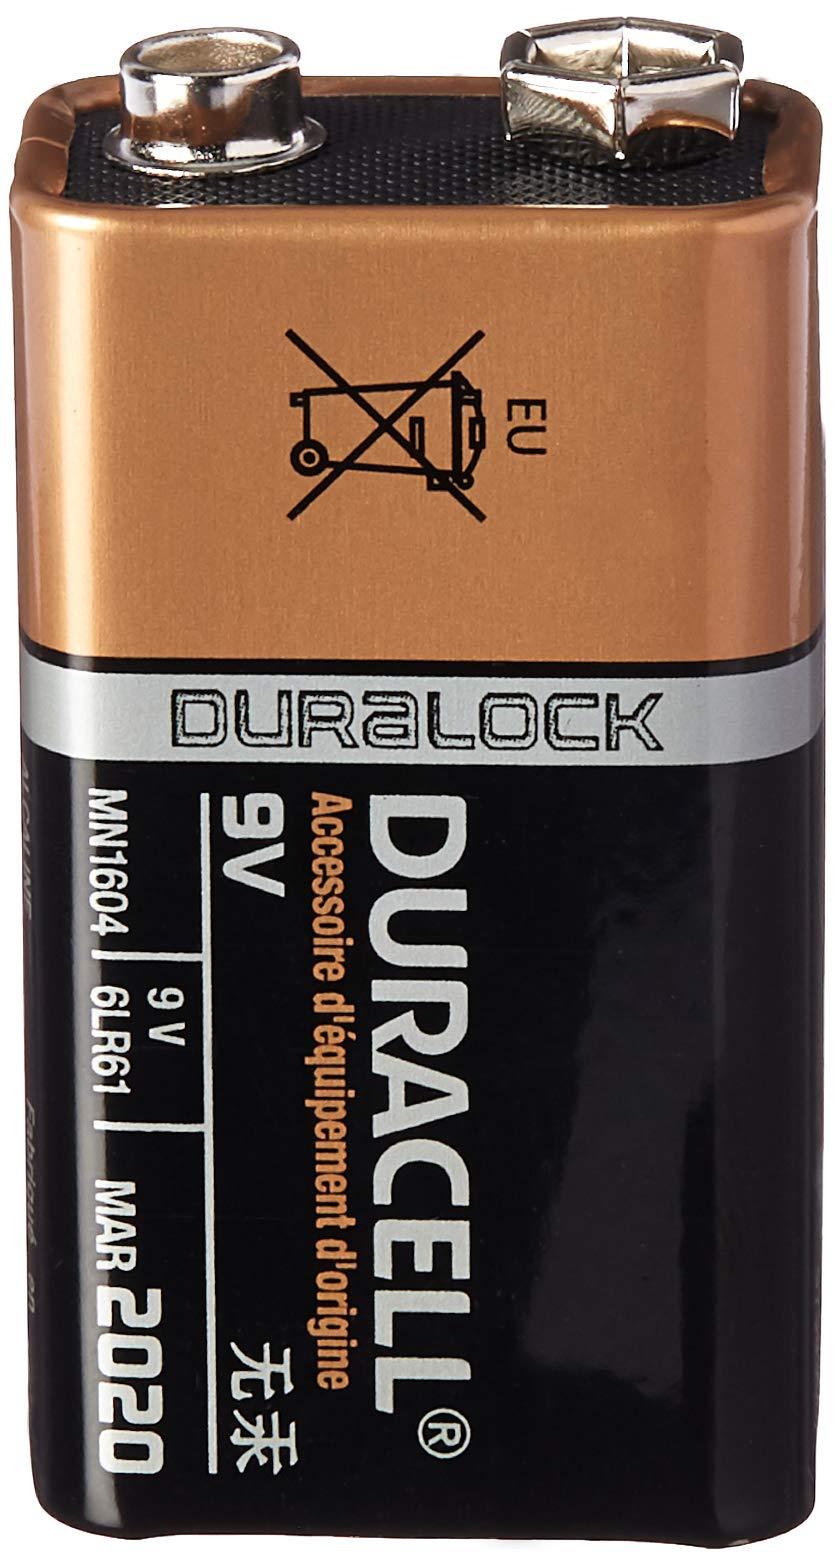 Duracell 9 Volt Battery by Duracell